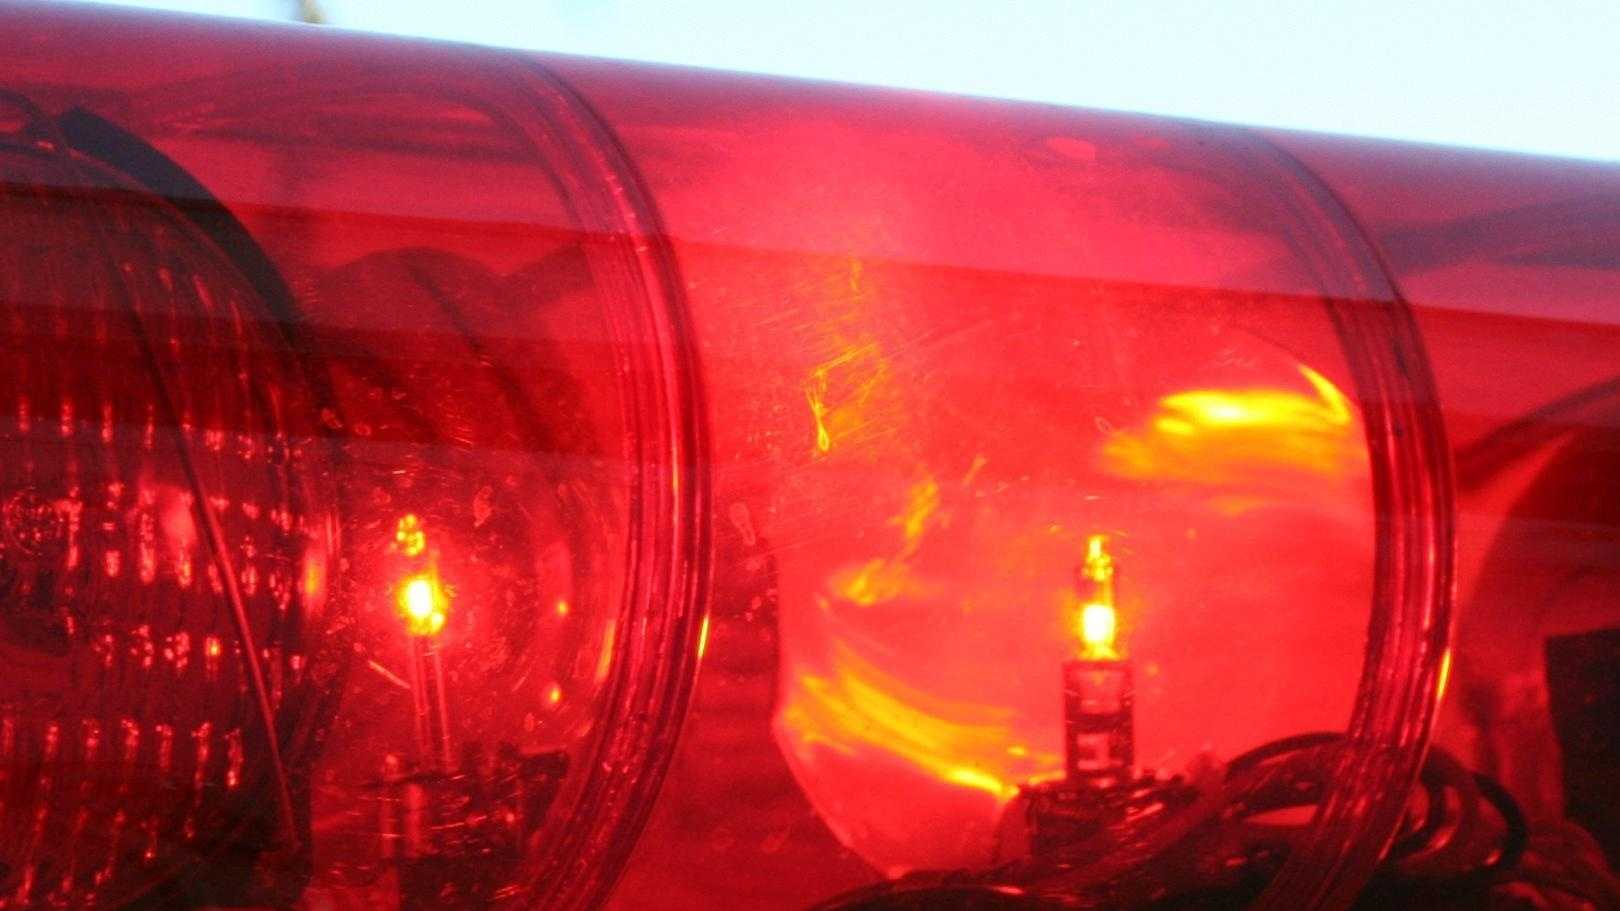 Ambulance Red Light Emergency Generic - 23591878